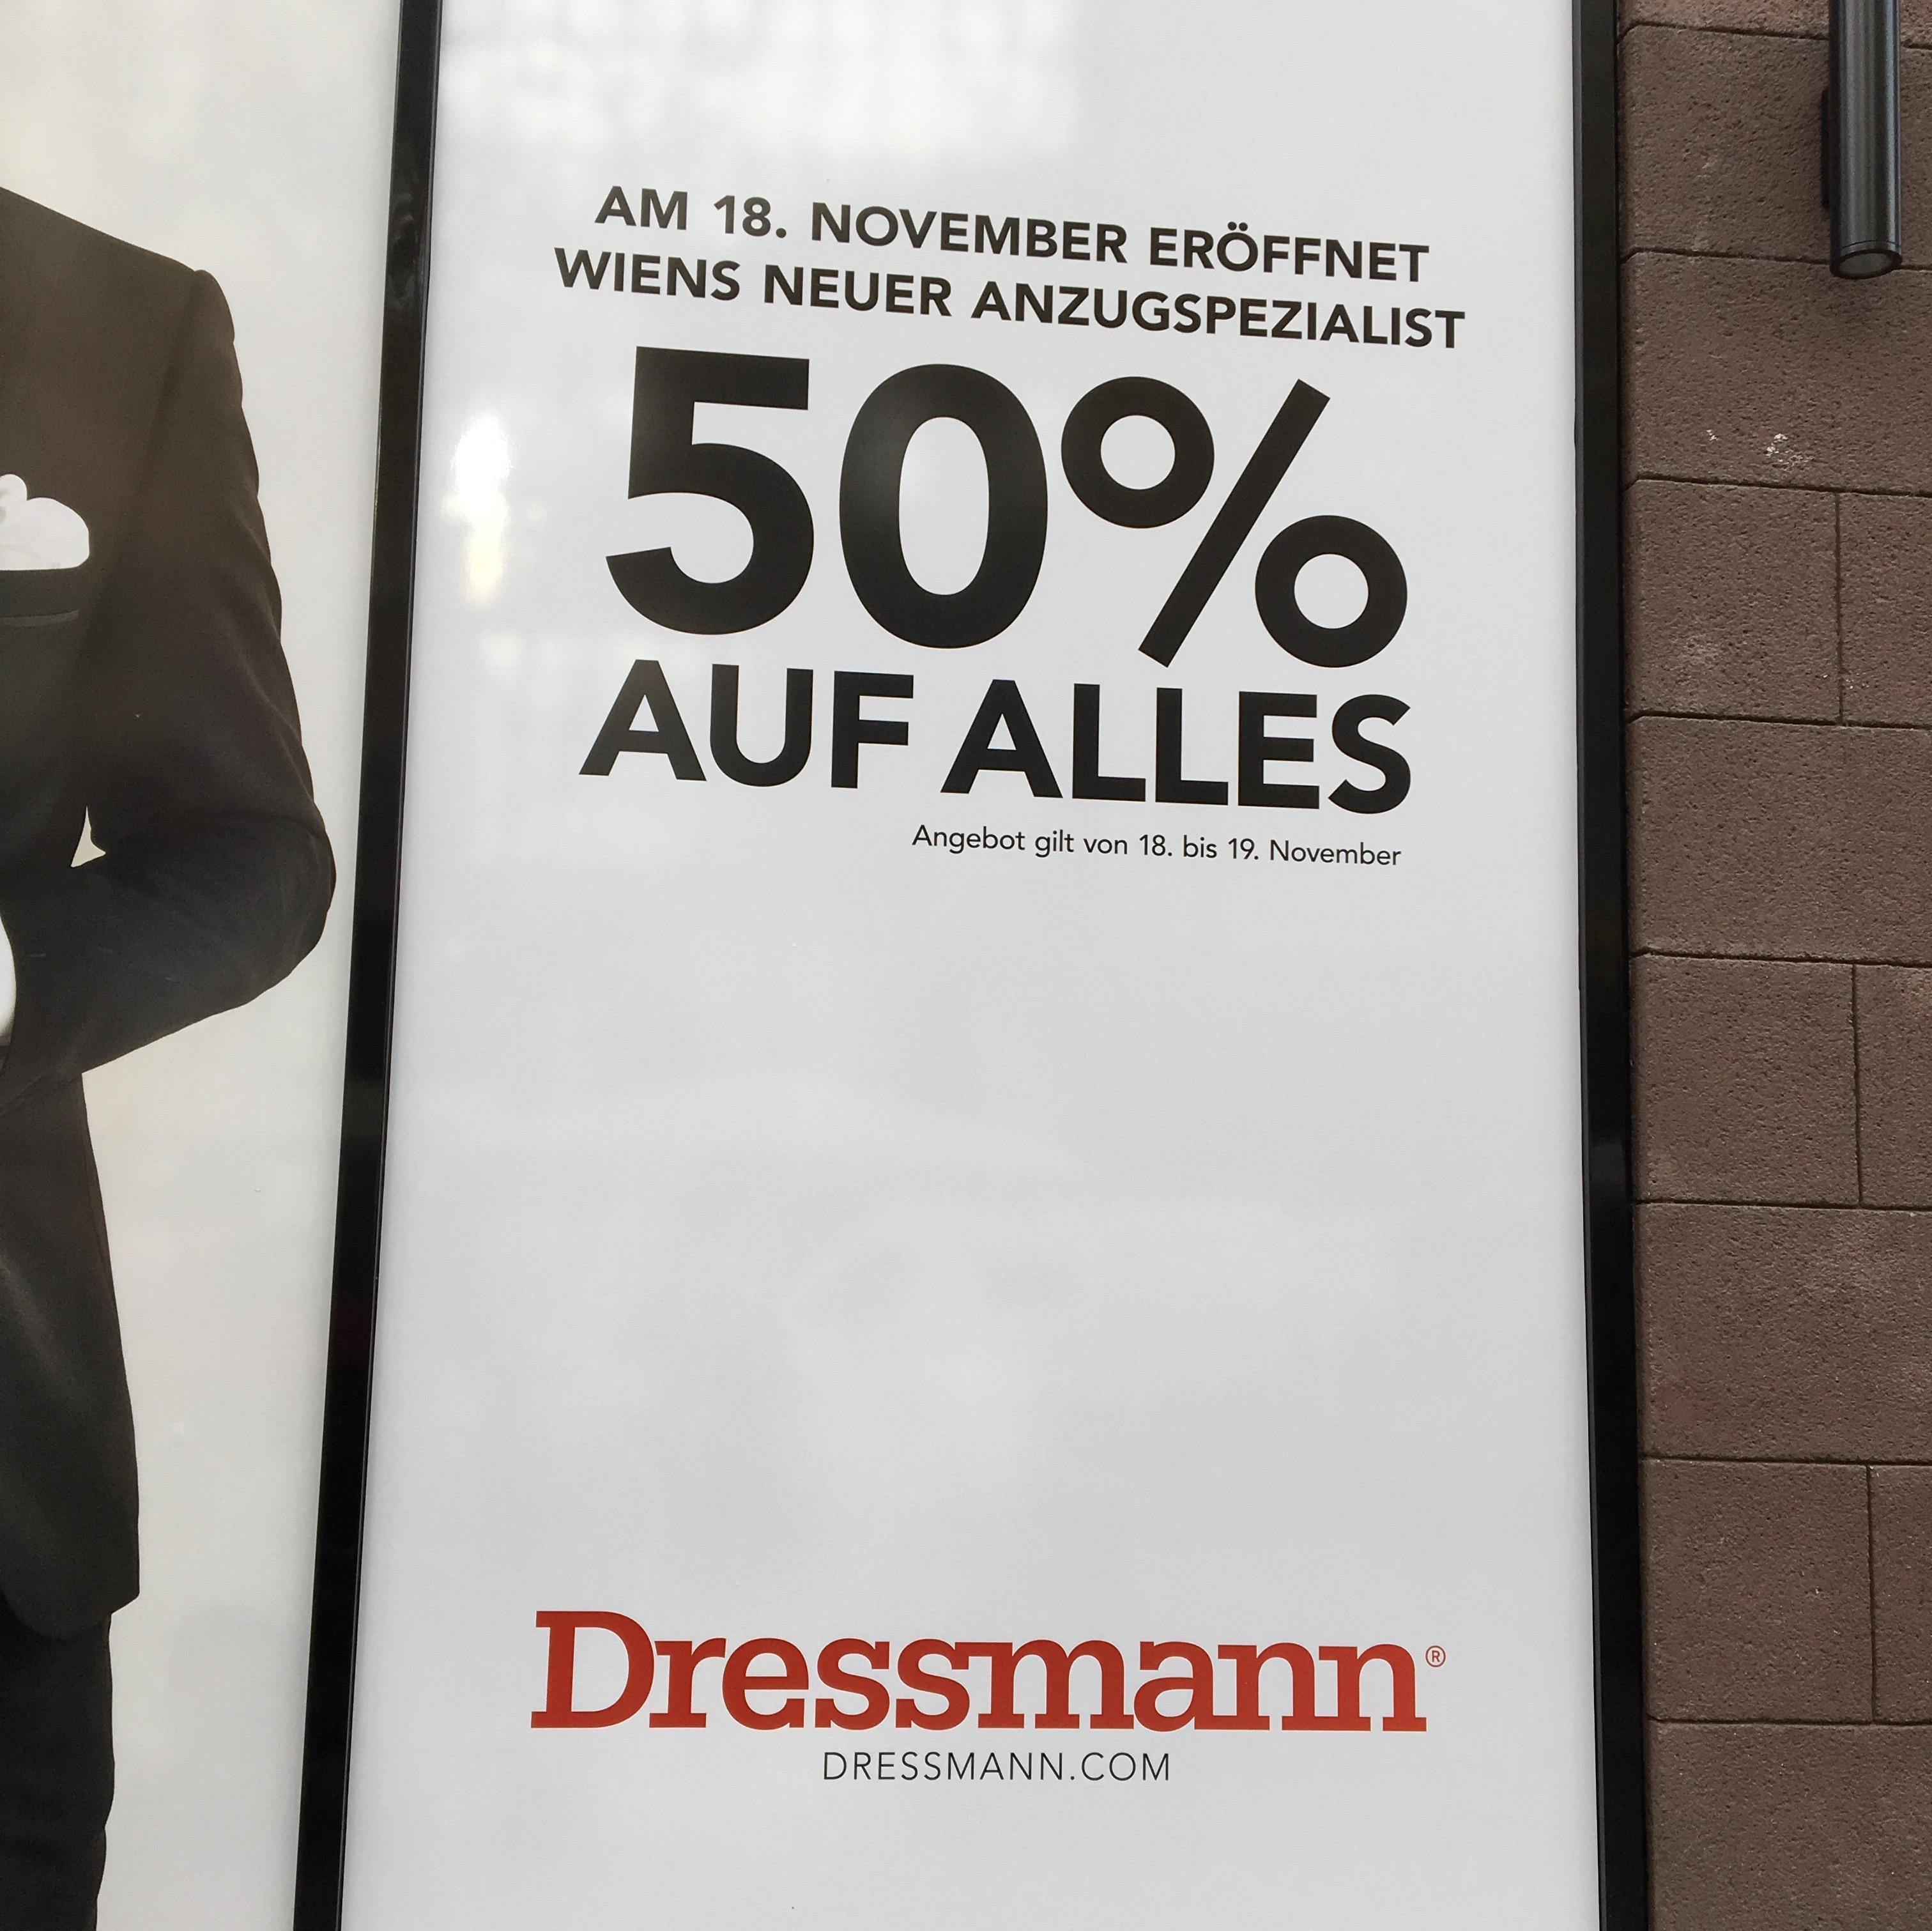 Dressmann Wien Mariahilferstraße 50% am 18./19.11